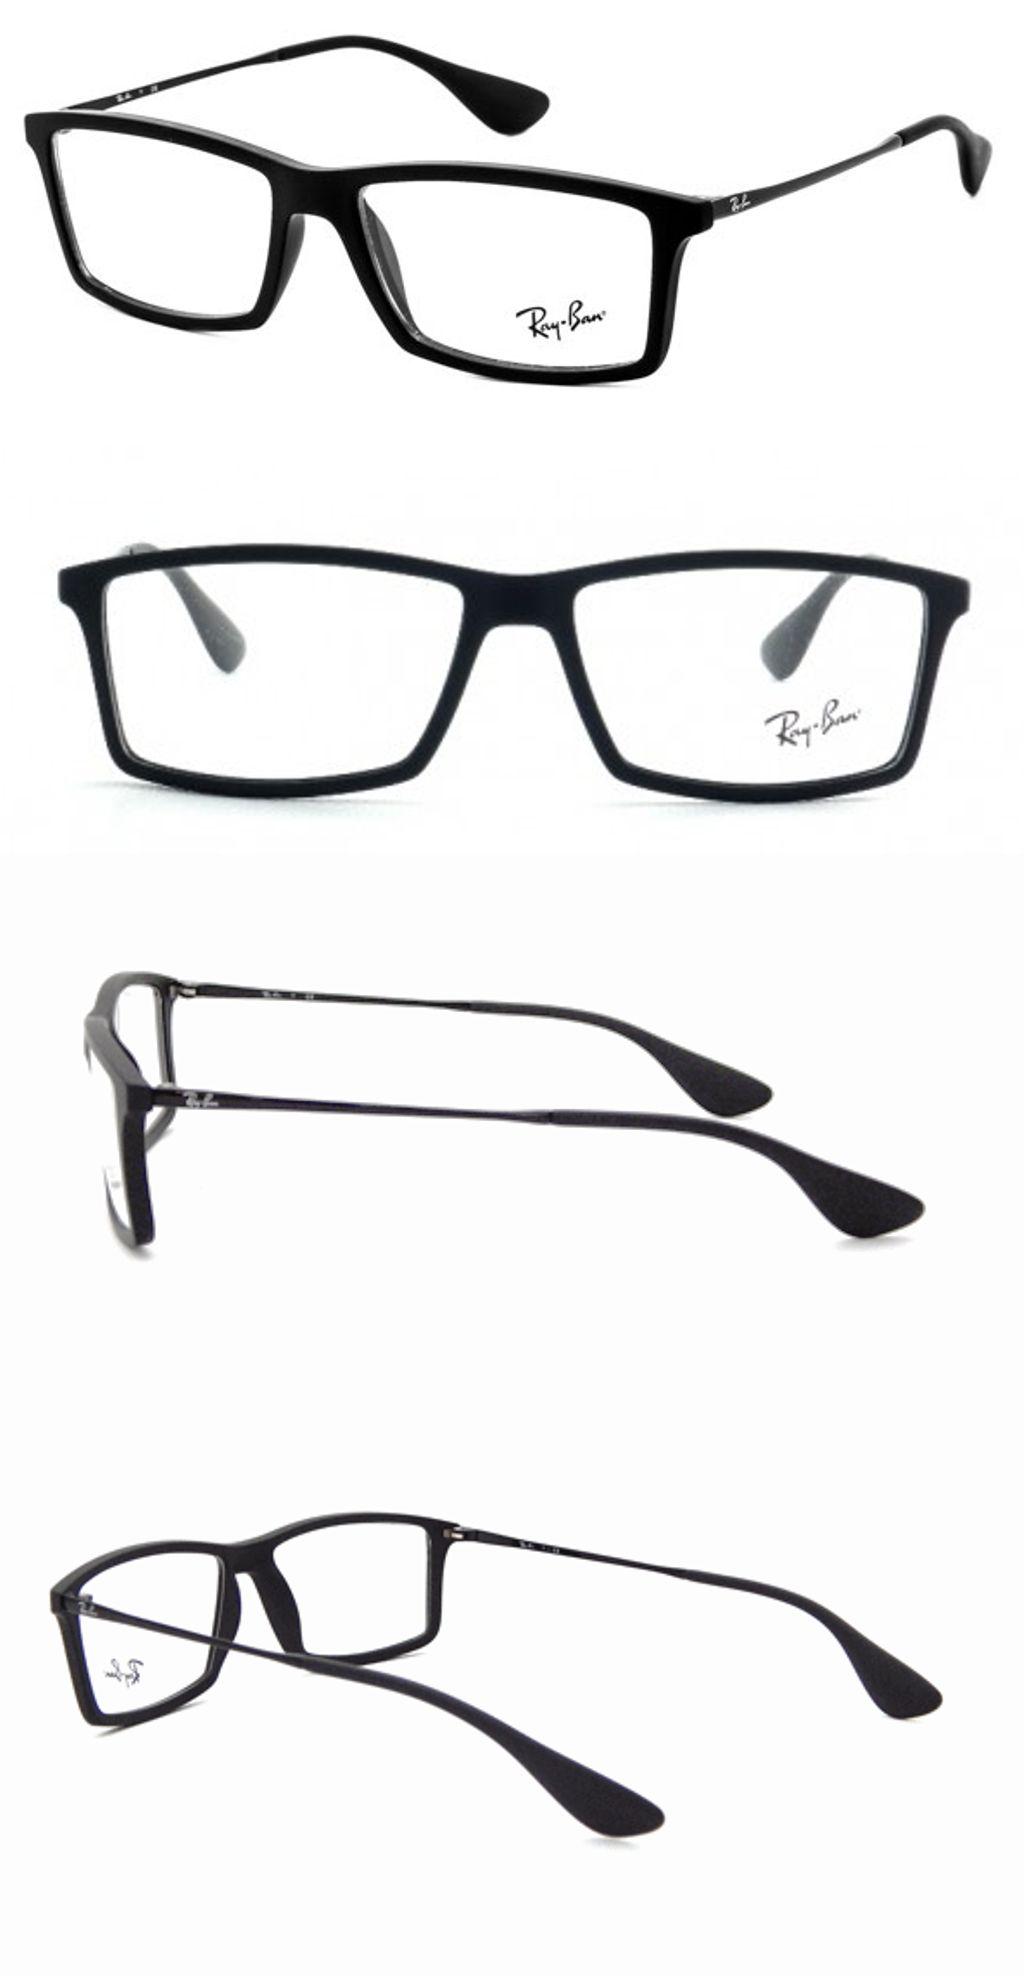 14097a3cca8f3 Eyeglass Frames  New 100% Authentic Ray- Ban Mens Eyeglasses Rb7021 5364  Mathew Black